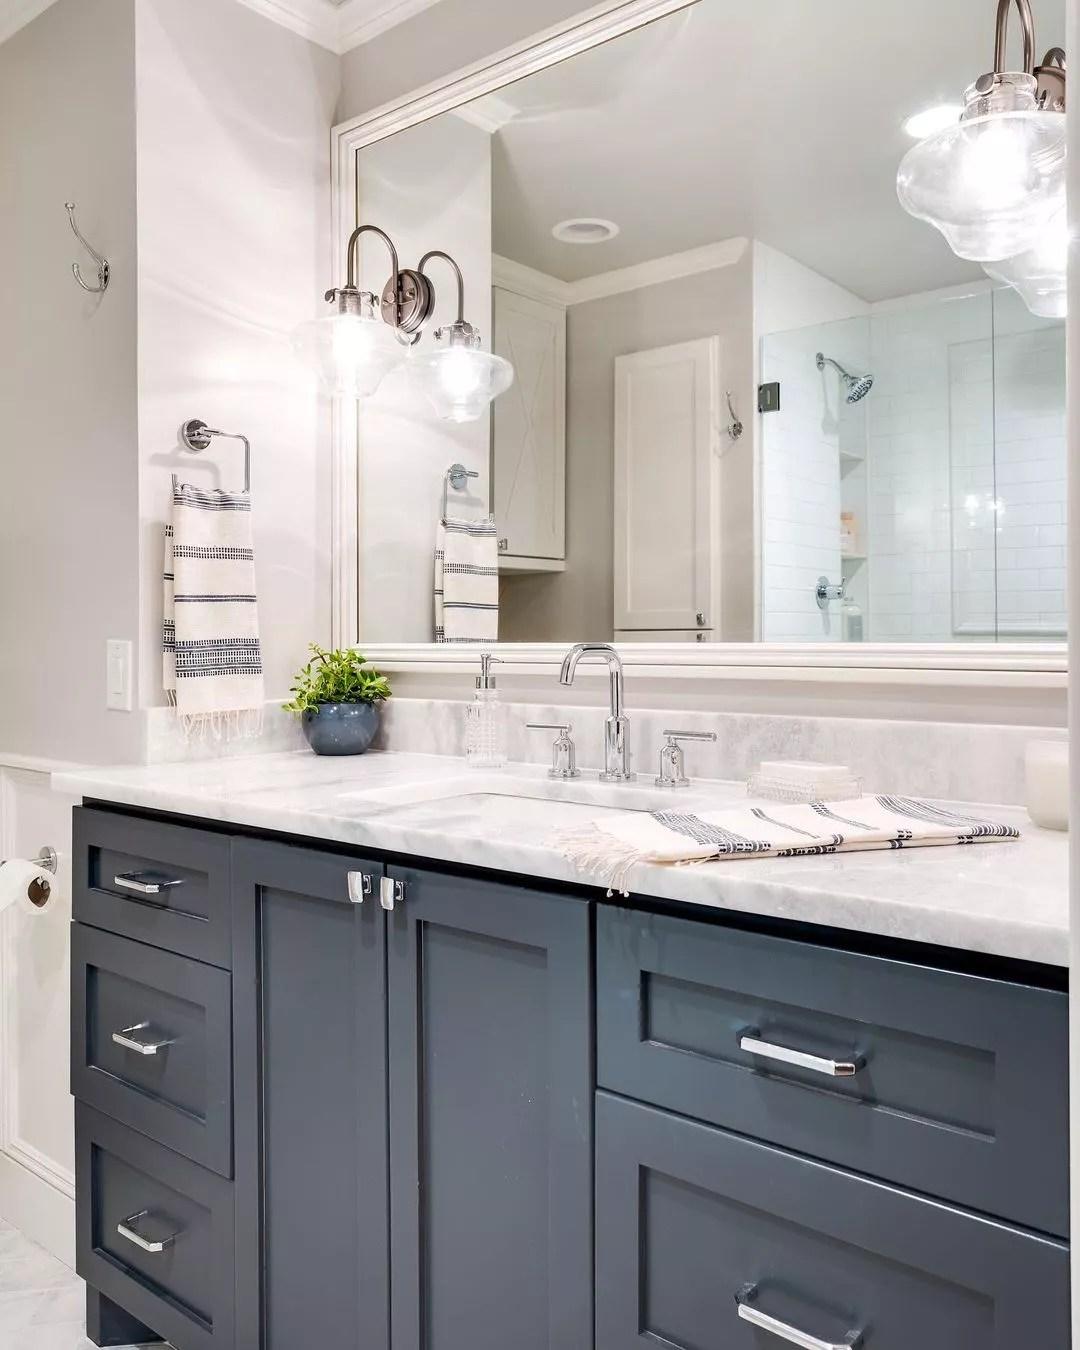 Bathroom with energy-efficient light fixtures. Photo by Instagram user @designdirectionsokc